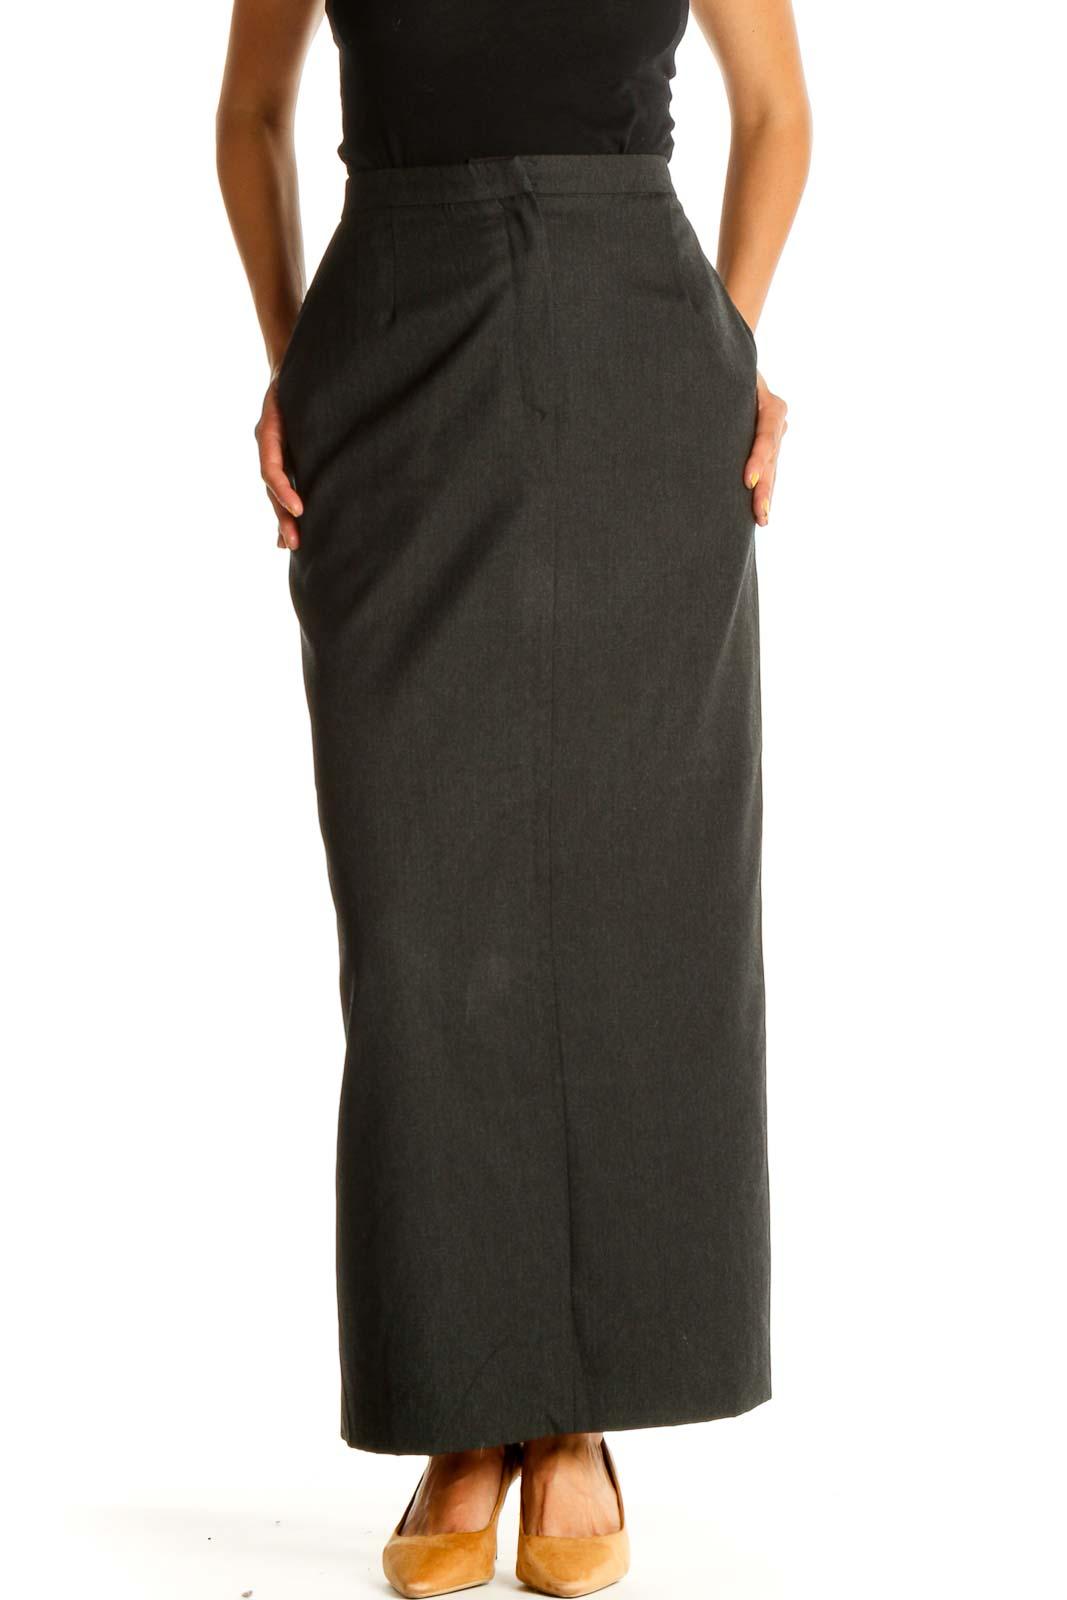 Green Solid Brunch Pencil Skirt Front